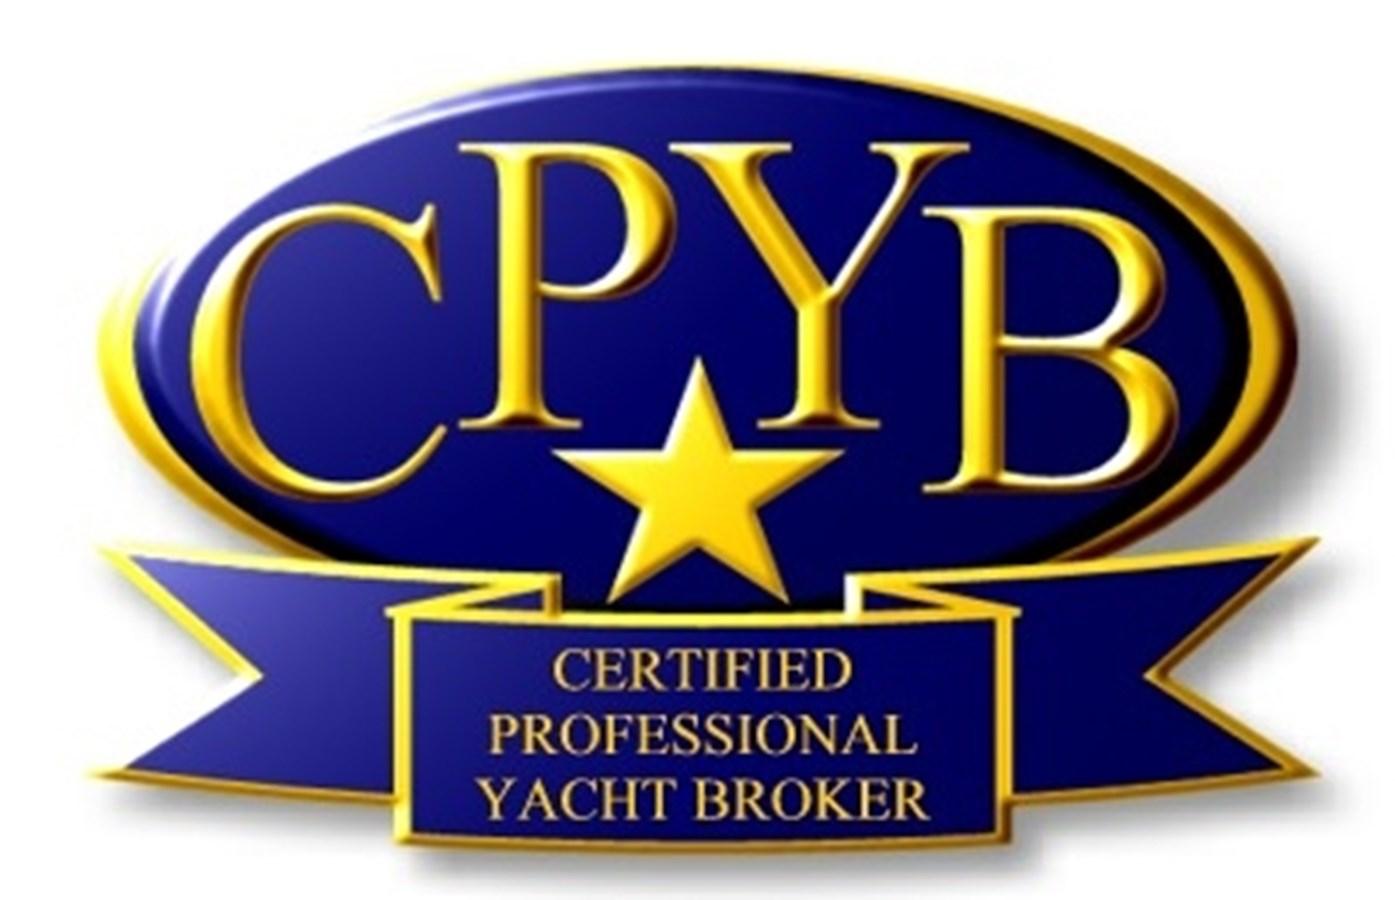 CPYB Logo 1995 CATALINA  Sloop 2767417